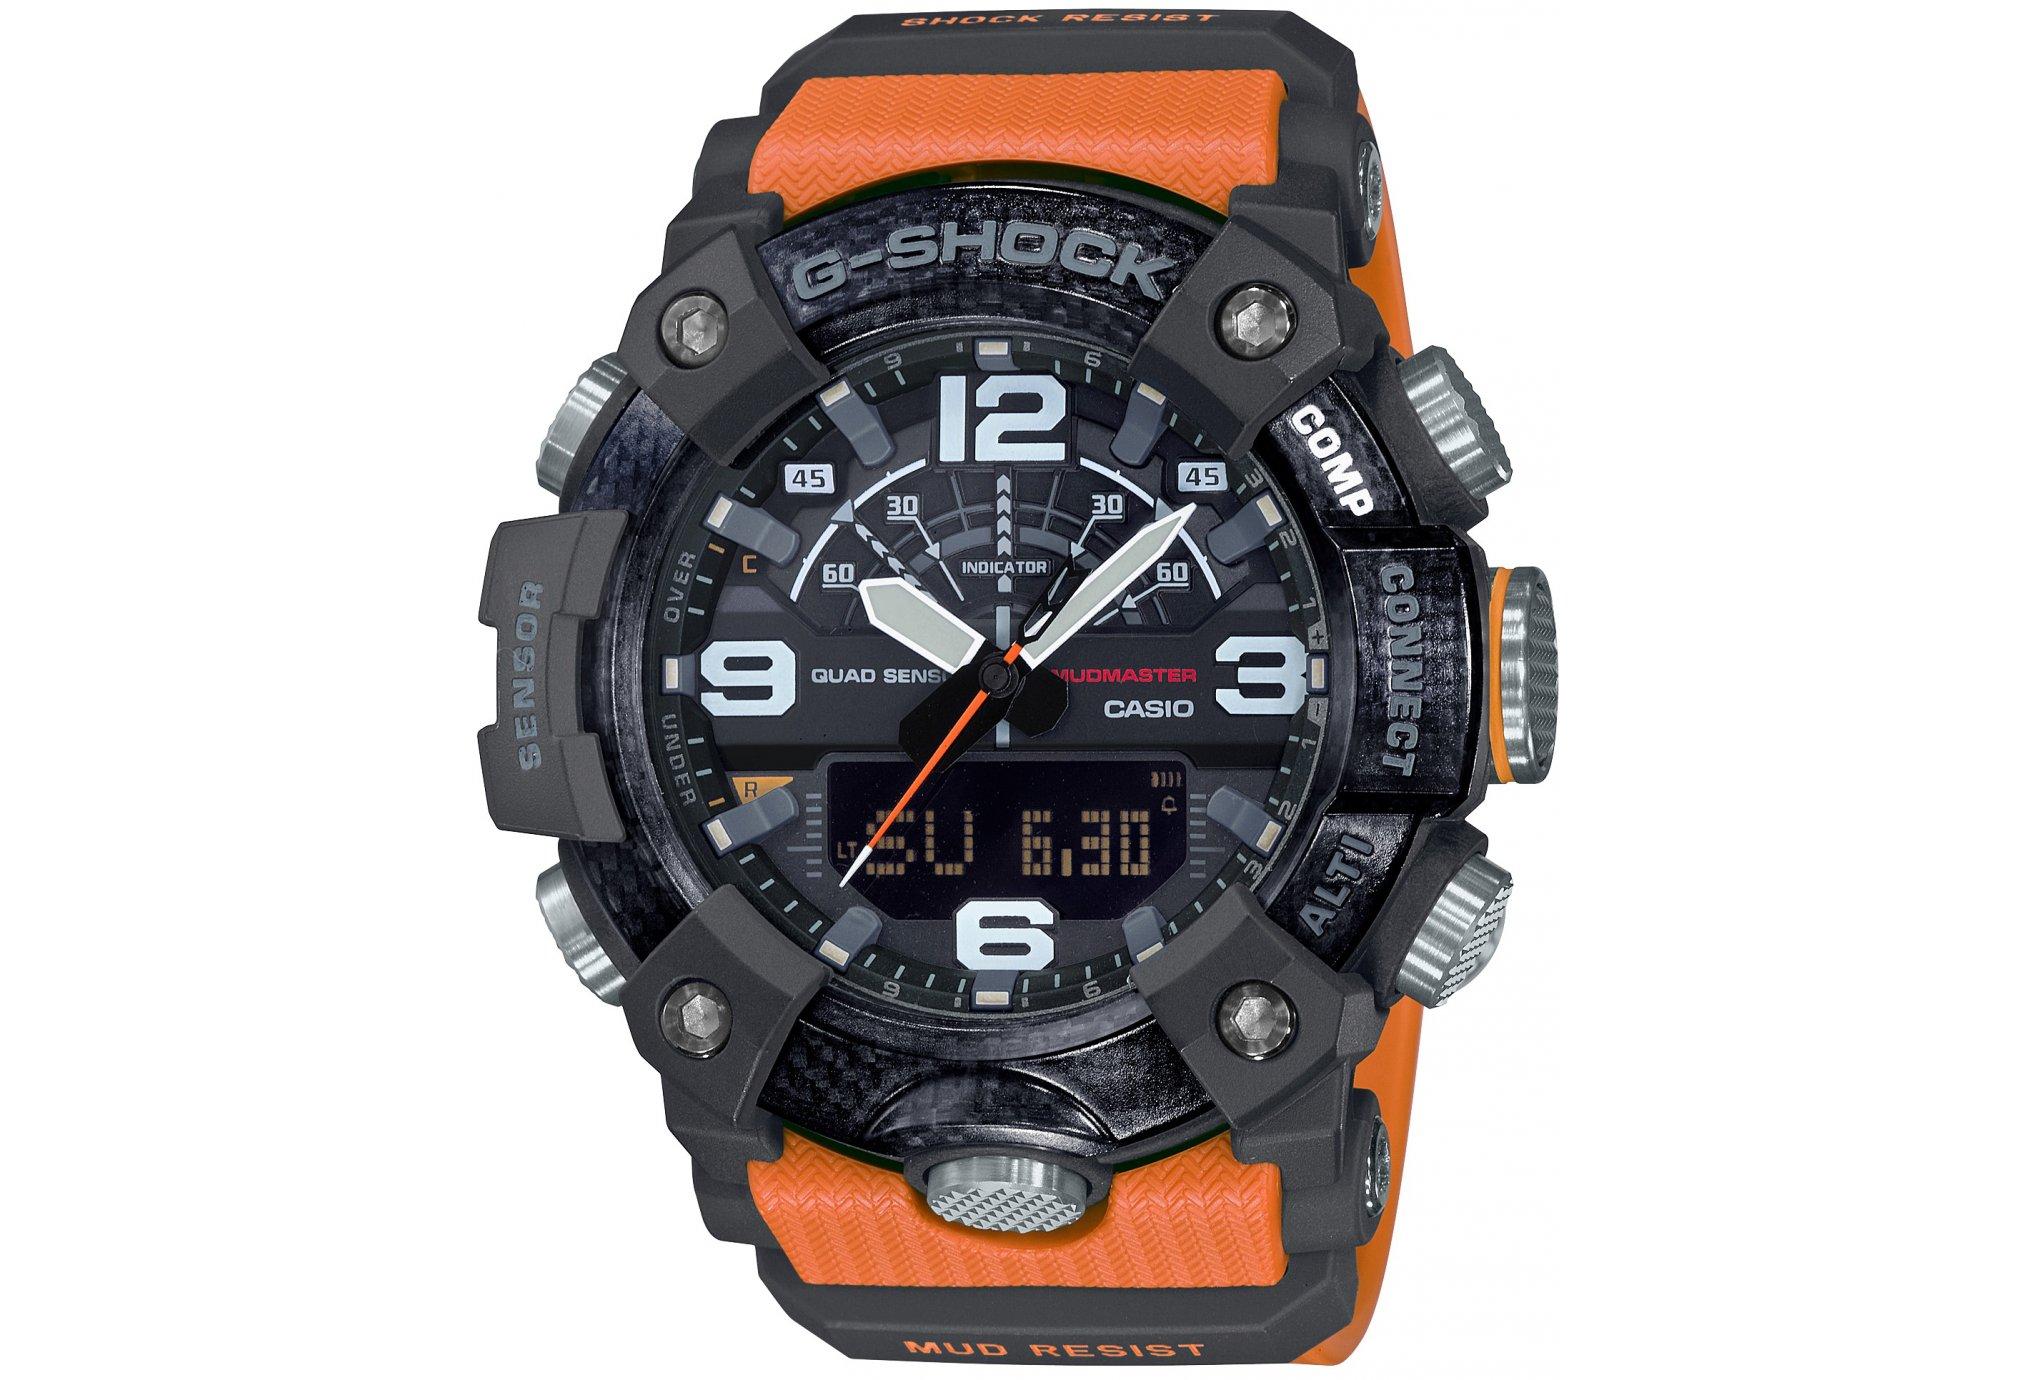 Casio G-Shock gg-b100-1a9er montres de sport